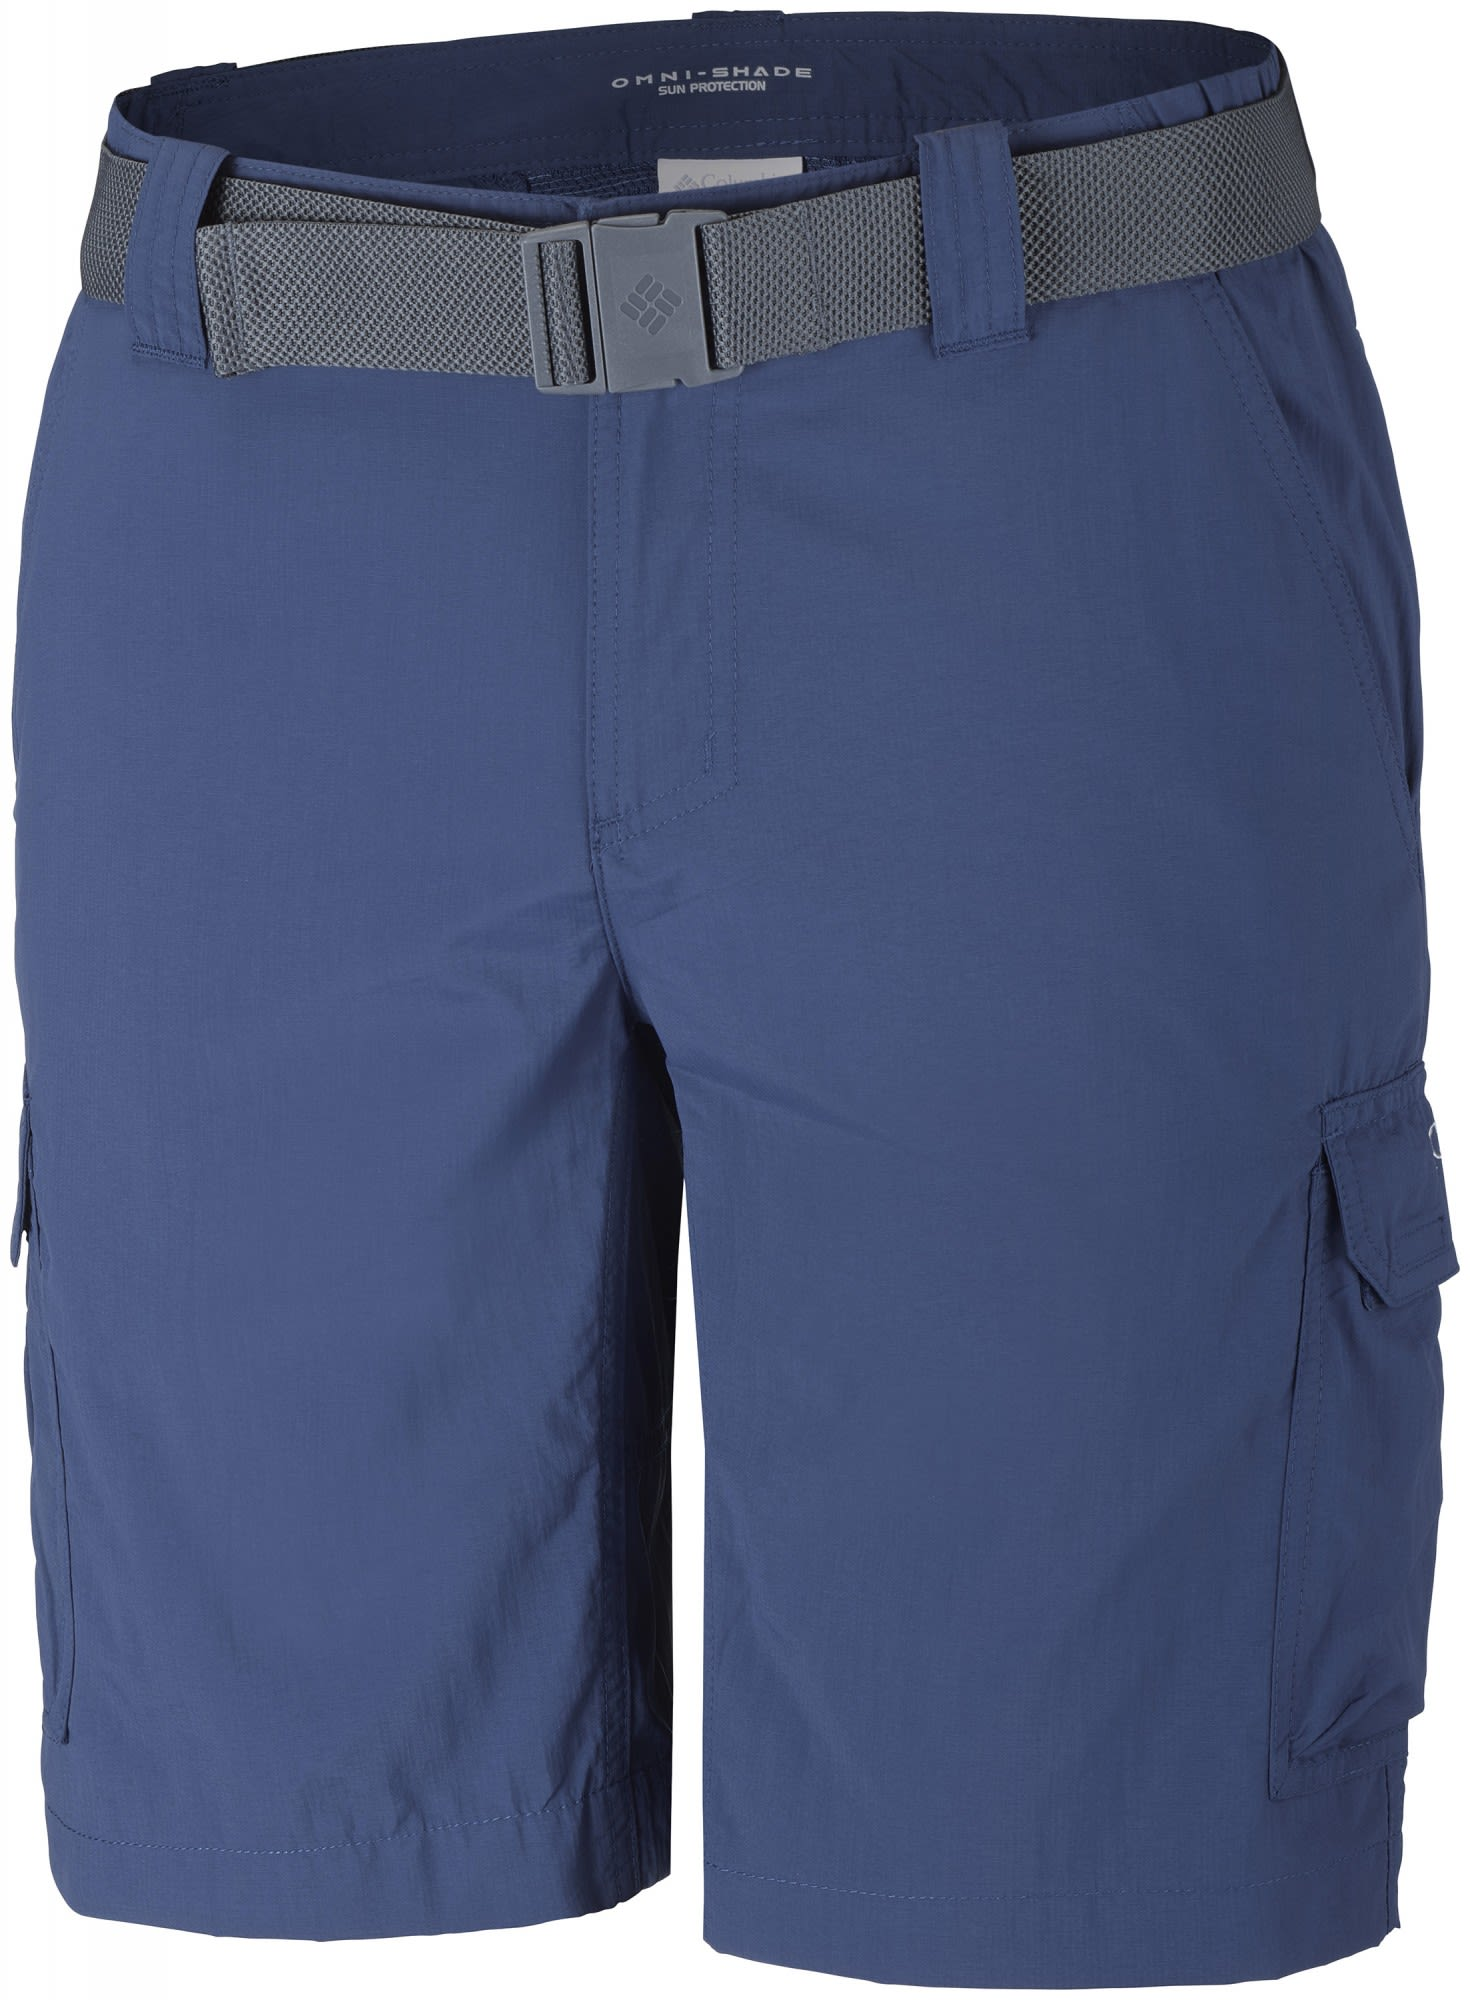 Columbia Silver Ridge II Cargo Short Blau, Male Shorts, 36 -10